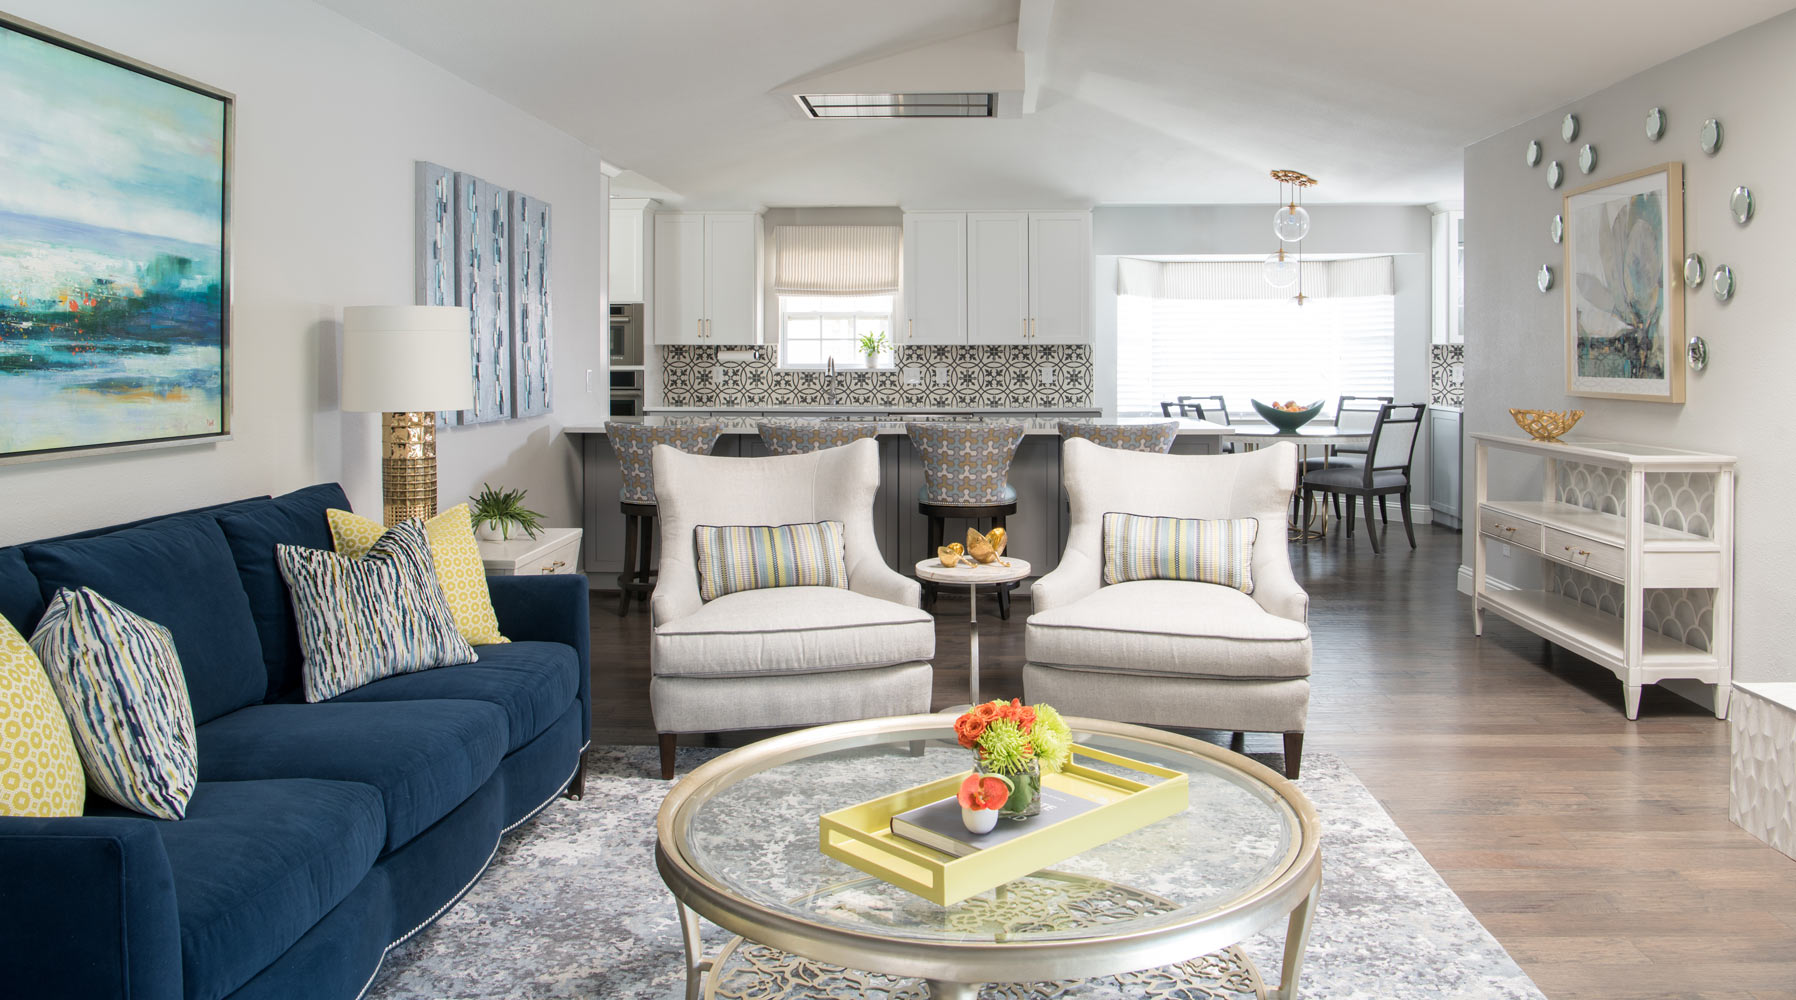 transitional-decor-dallas-living-room-interiors